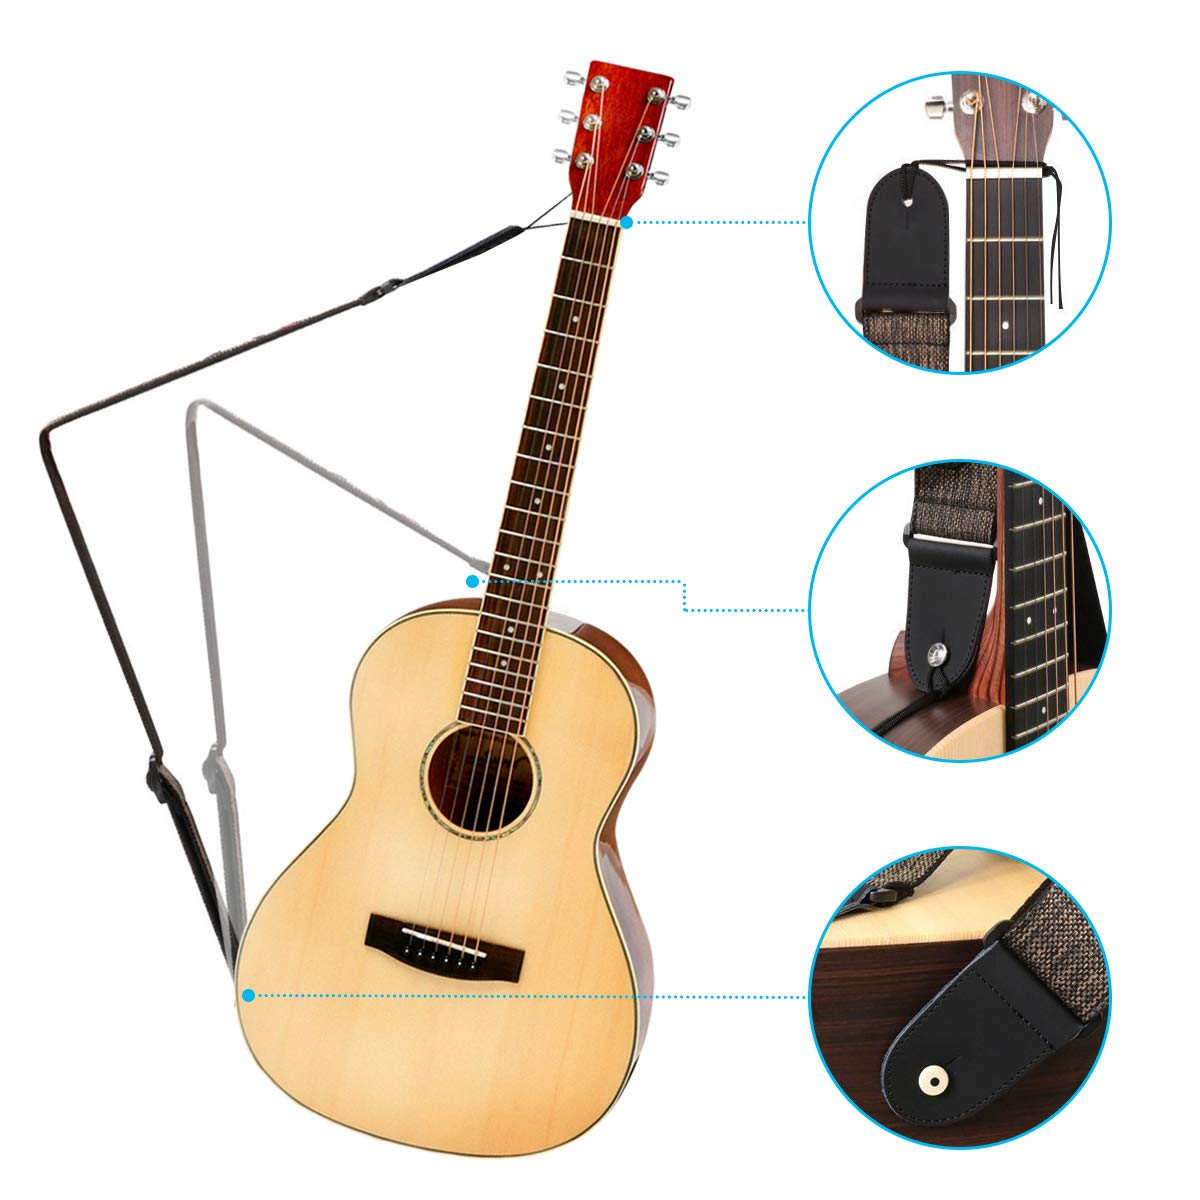 Correa de Guitarra, NASUM Ajustable para Guitarra Acústica Eléctrica Bass Ukelele para Hombres/Mujeres/Niños, con 6 Púas de Guitarra Longitud Ajustable 98 a ...